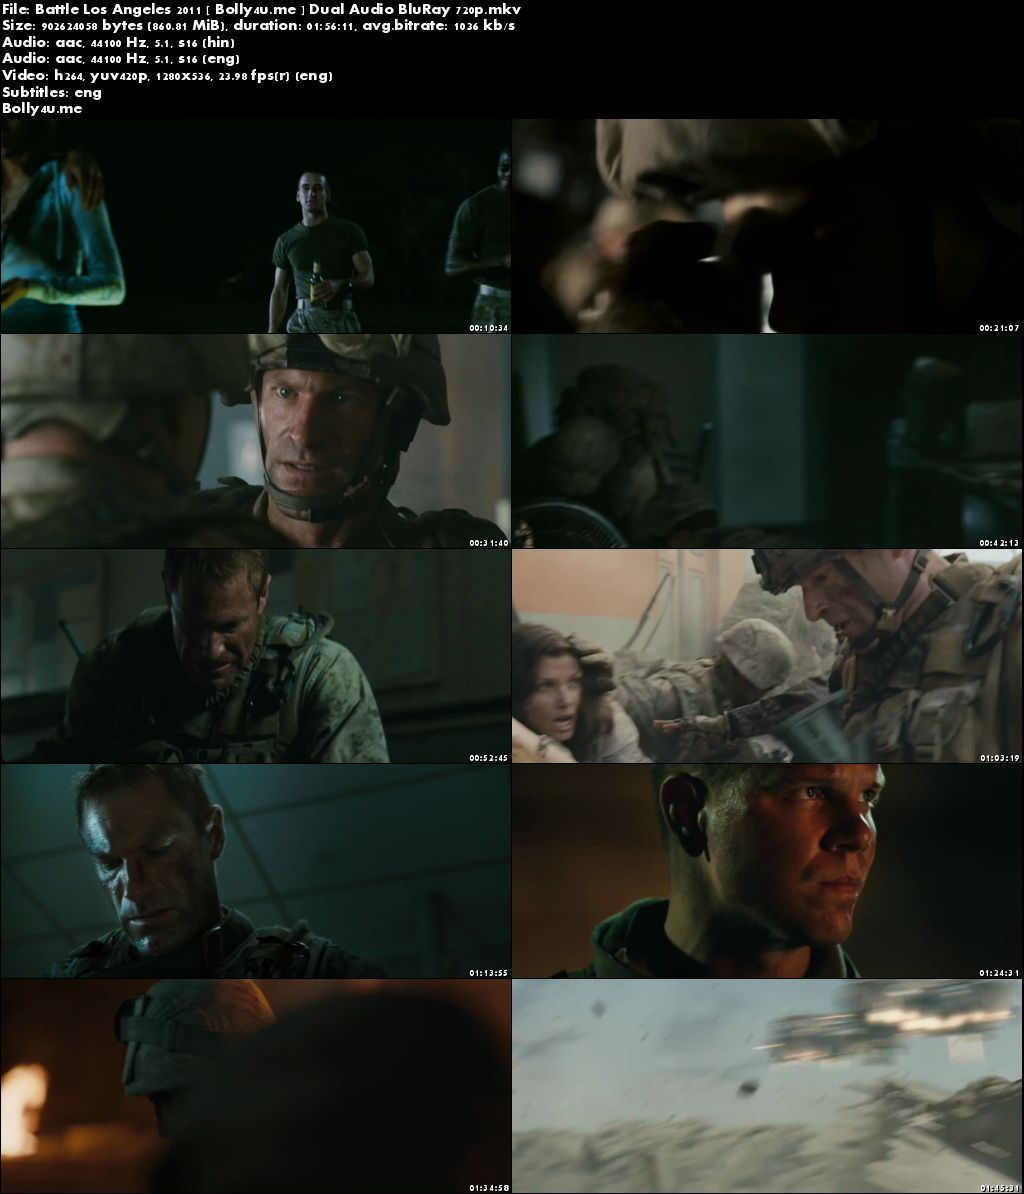 Battle Los Angeles 2011 BluRay 850MB Hindi Dual Audio 720p Download